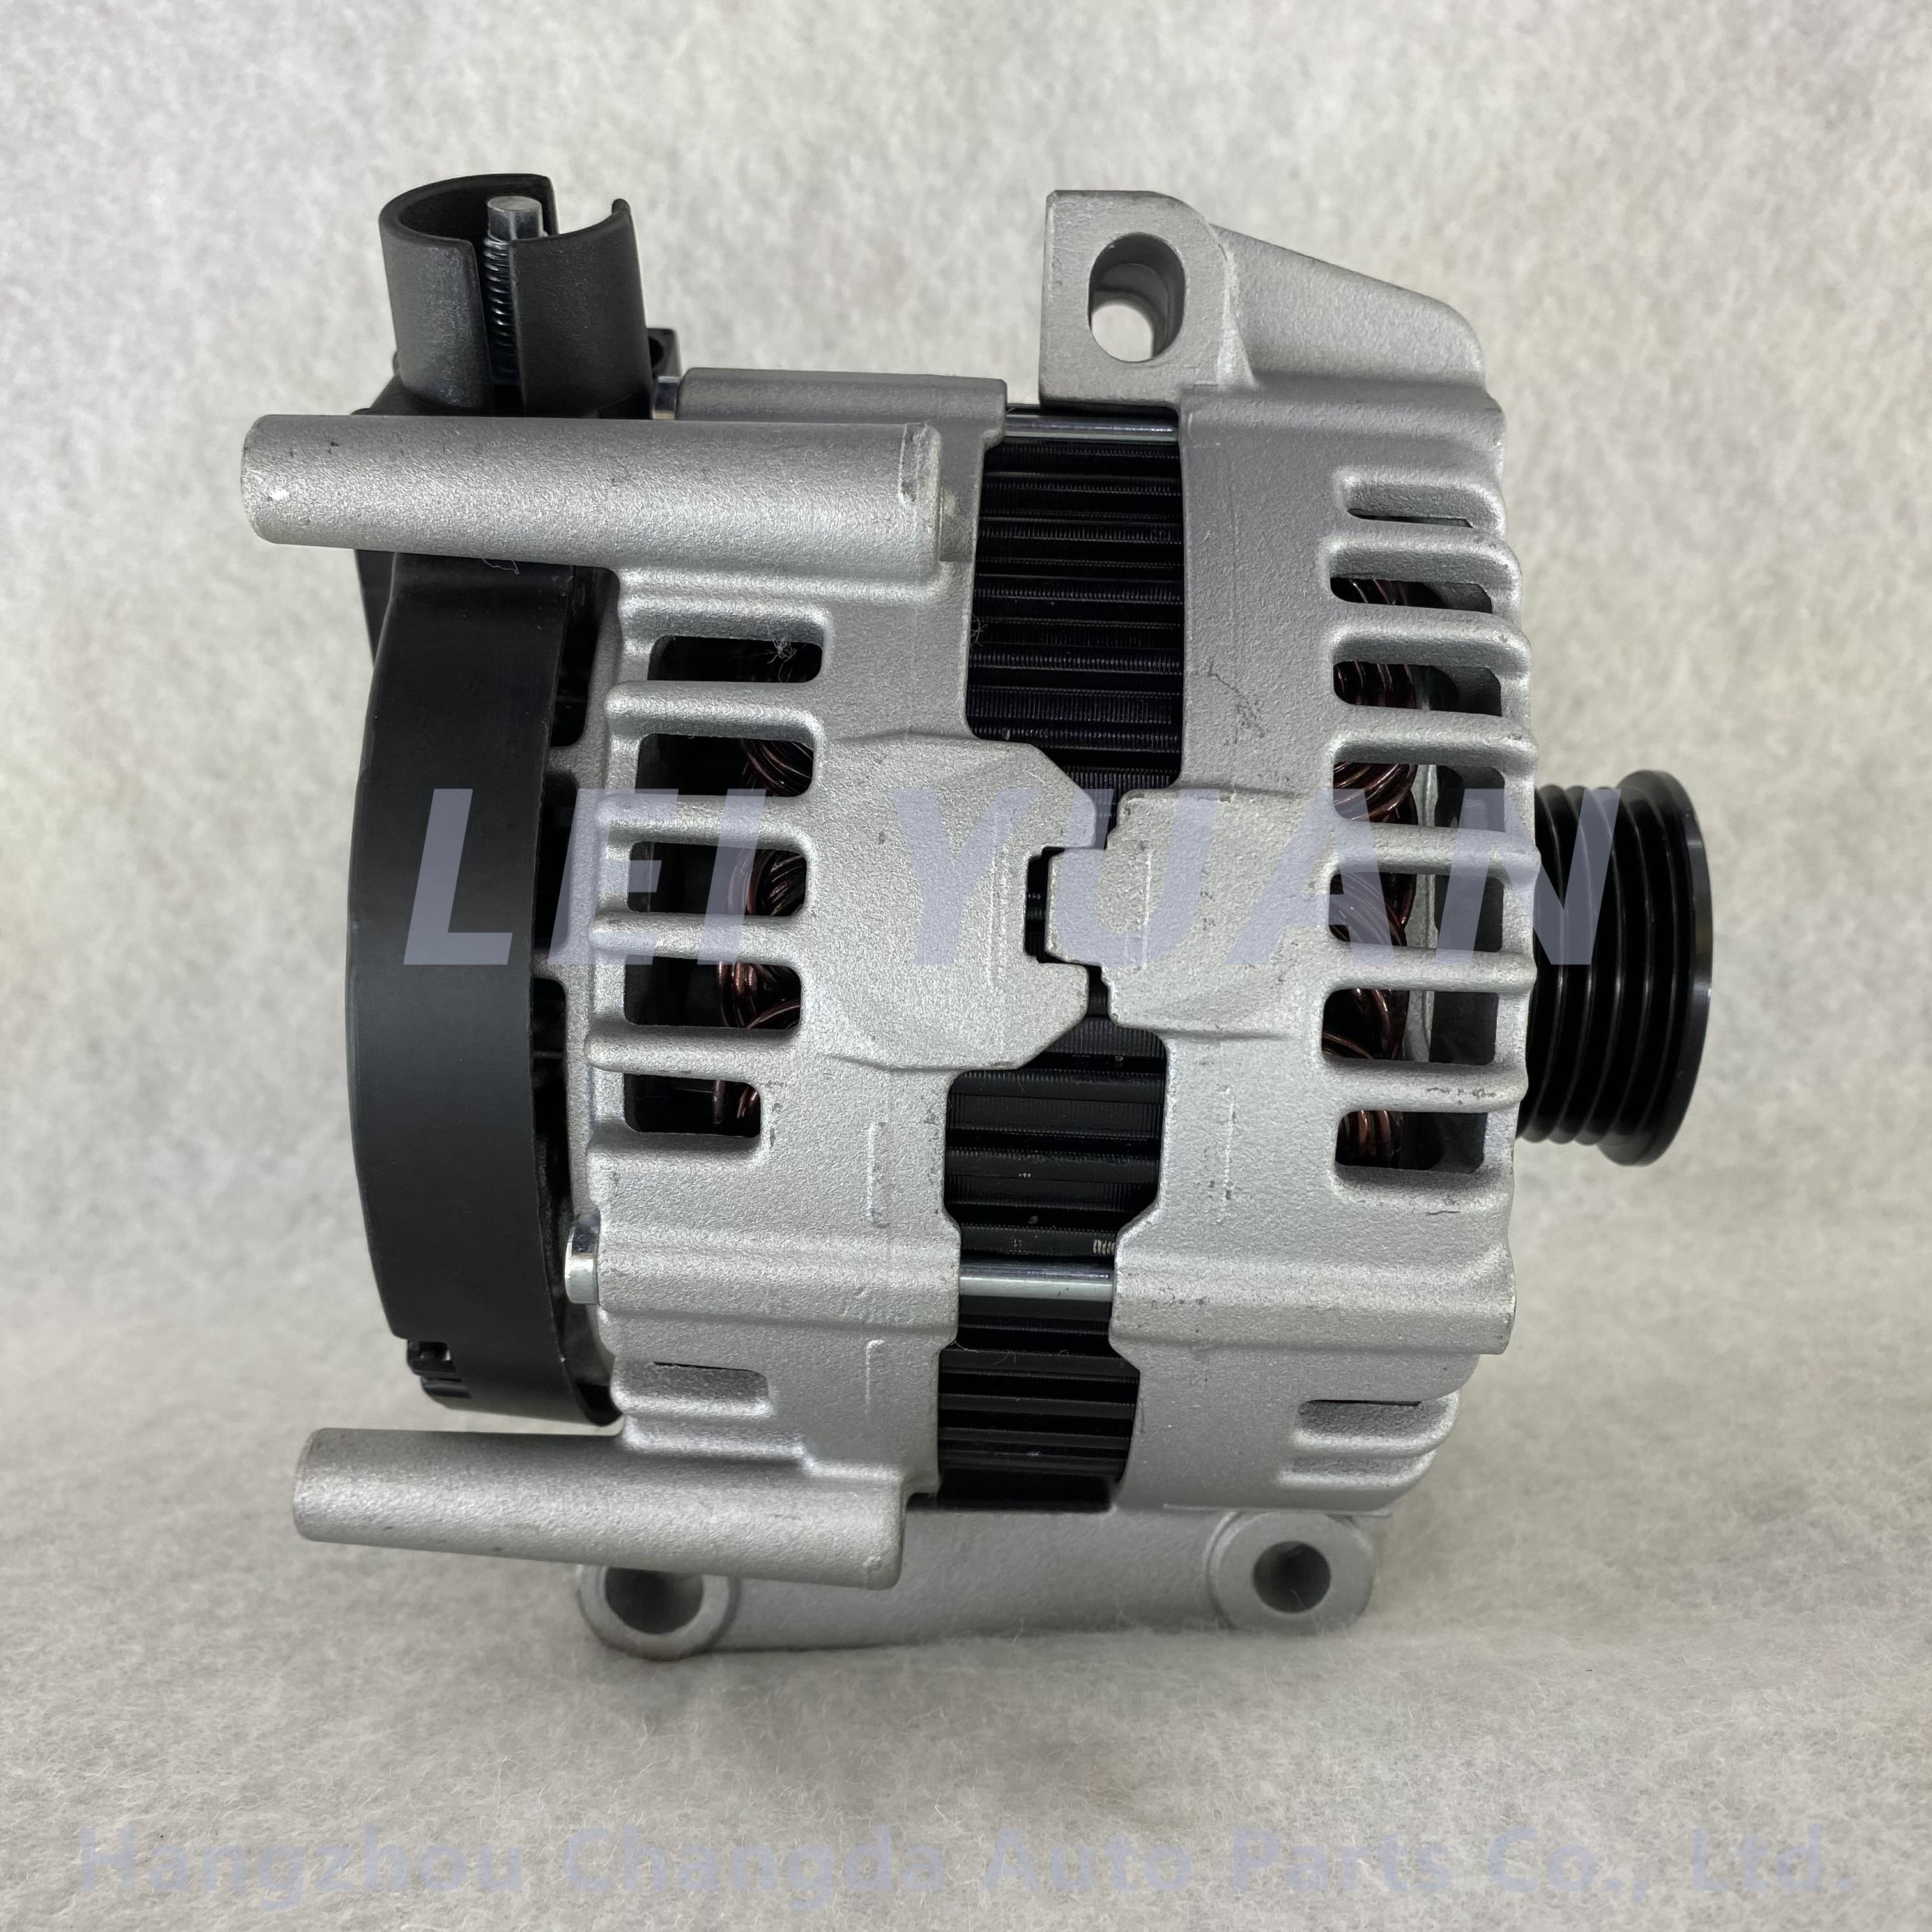 Hot sale car alternator for VOLVO XC90 4.4 0121715102 30667524 8603605 enlarge